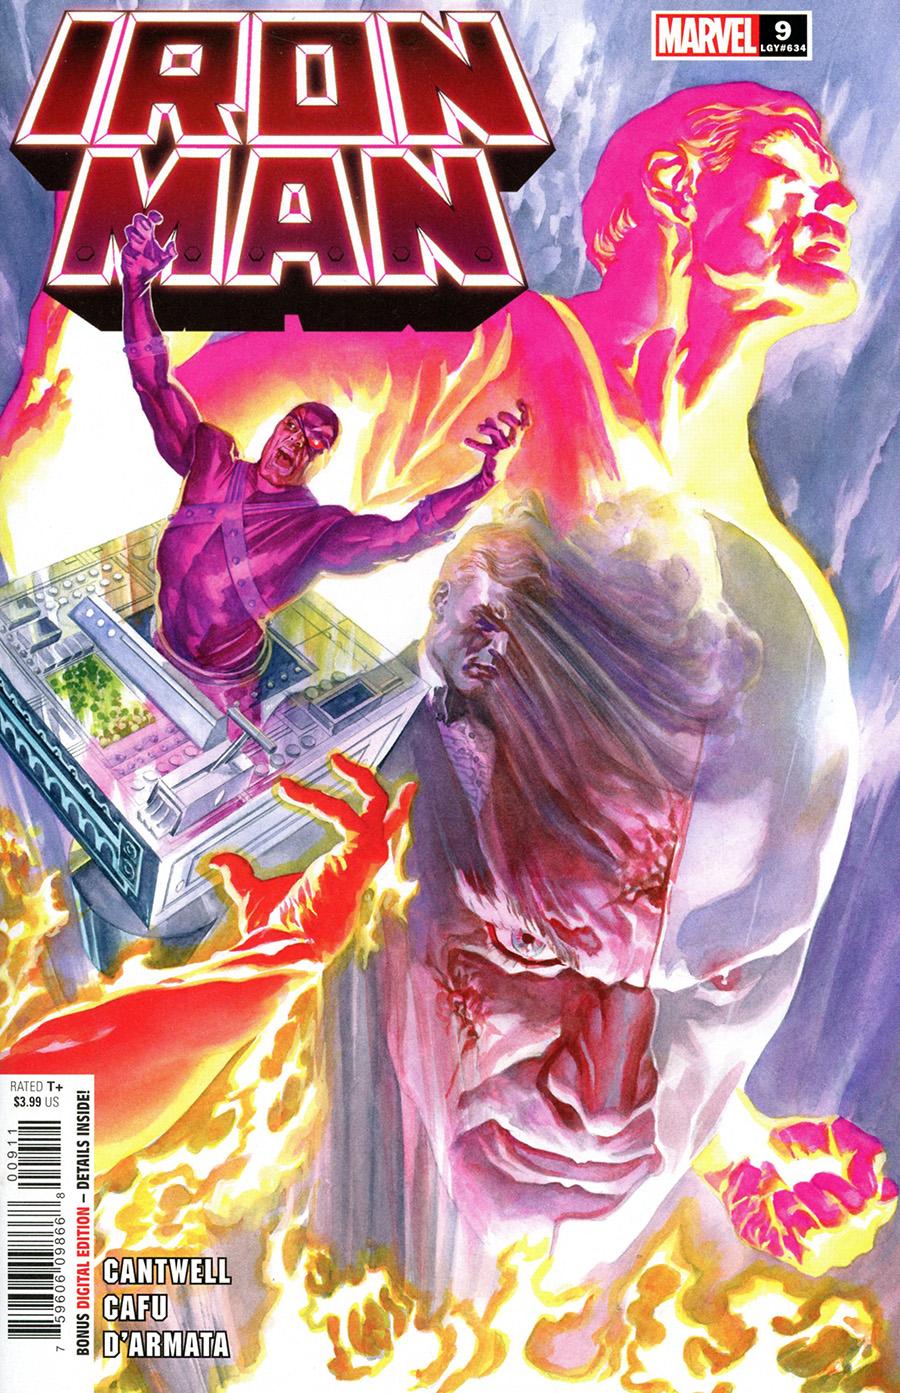 Iron Man Vol 6 #9 Cover A Regular Alex Ross Cover